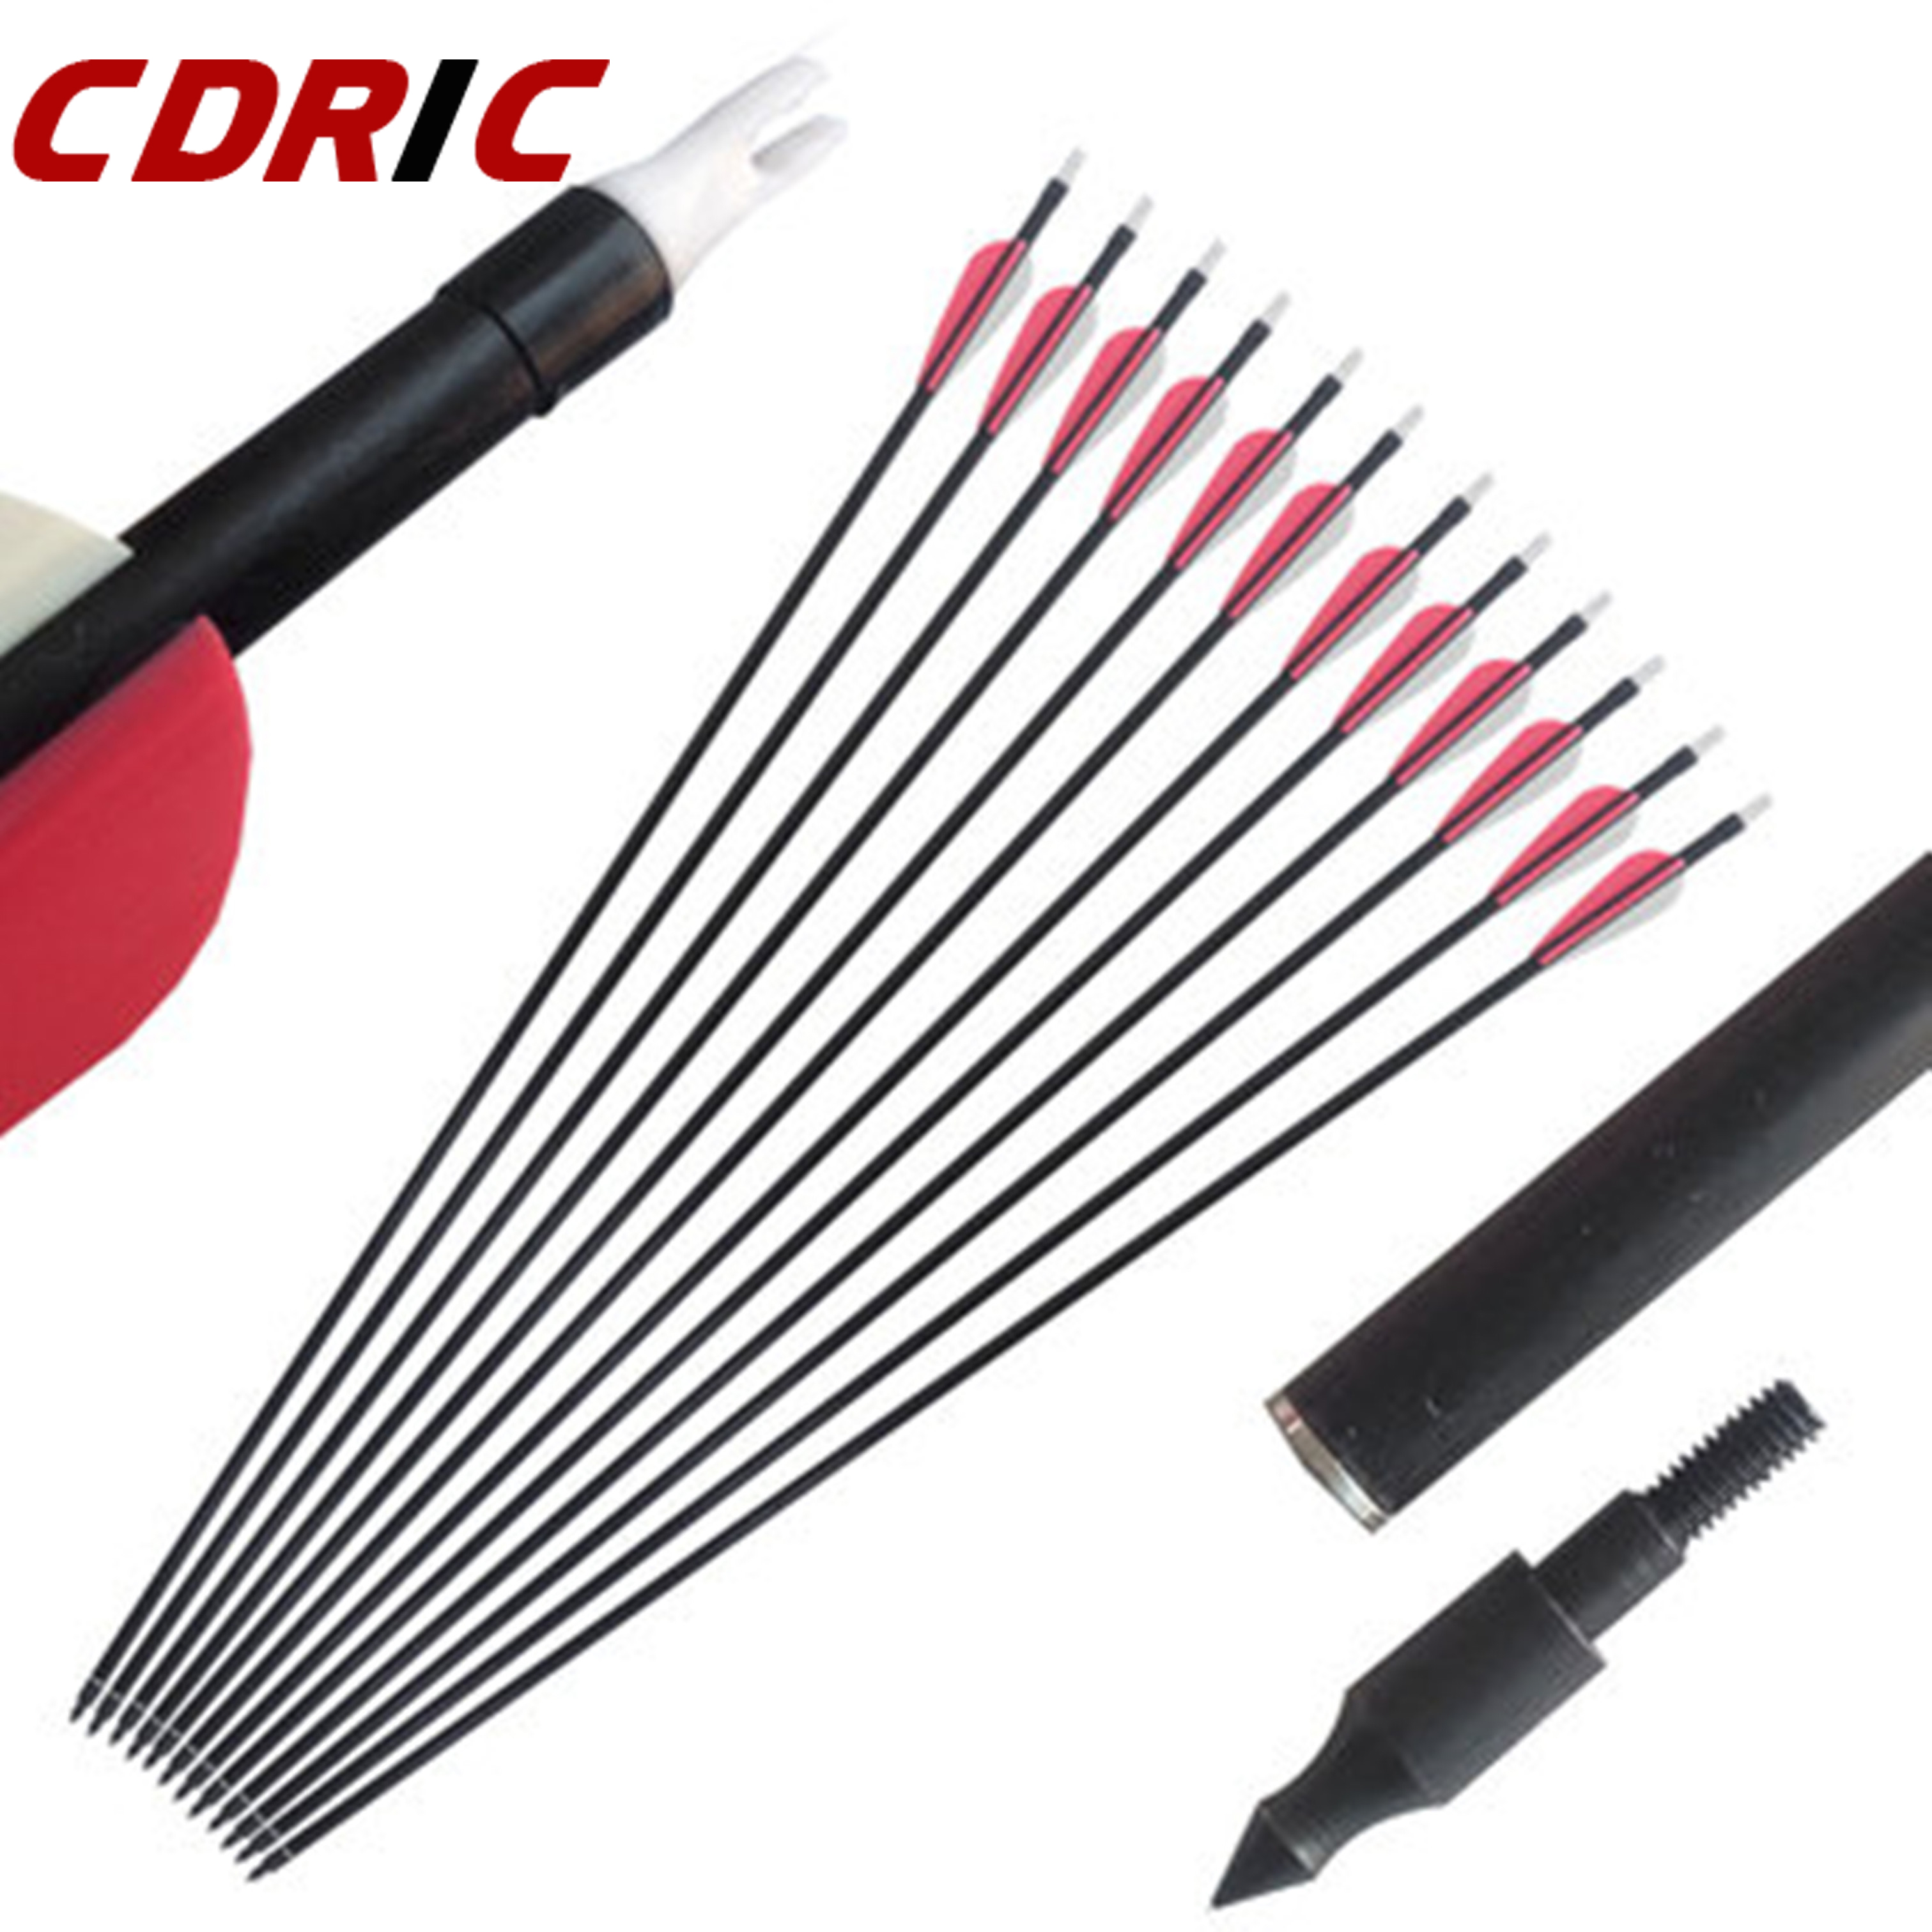 Free Shipping 6/12/24Pcs Fiberglass Arrow Spine 500 OD 8mm For Archery Bow Hunting